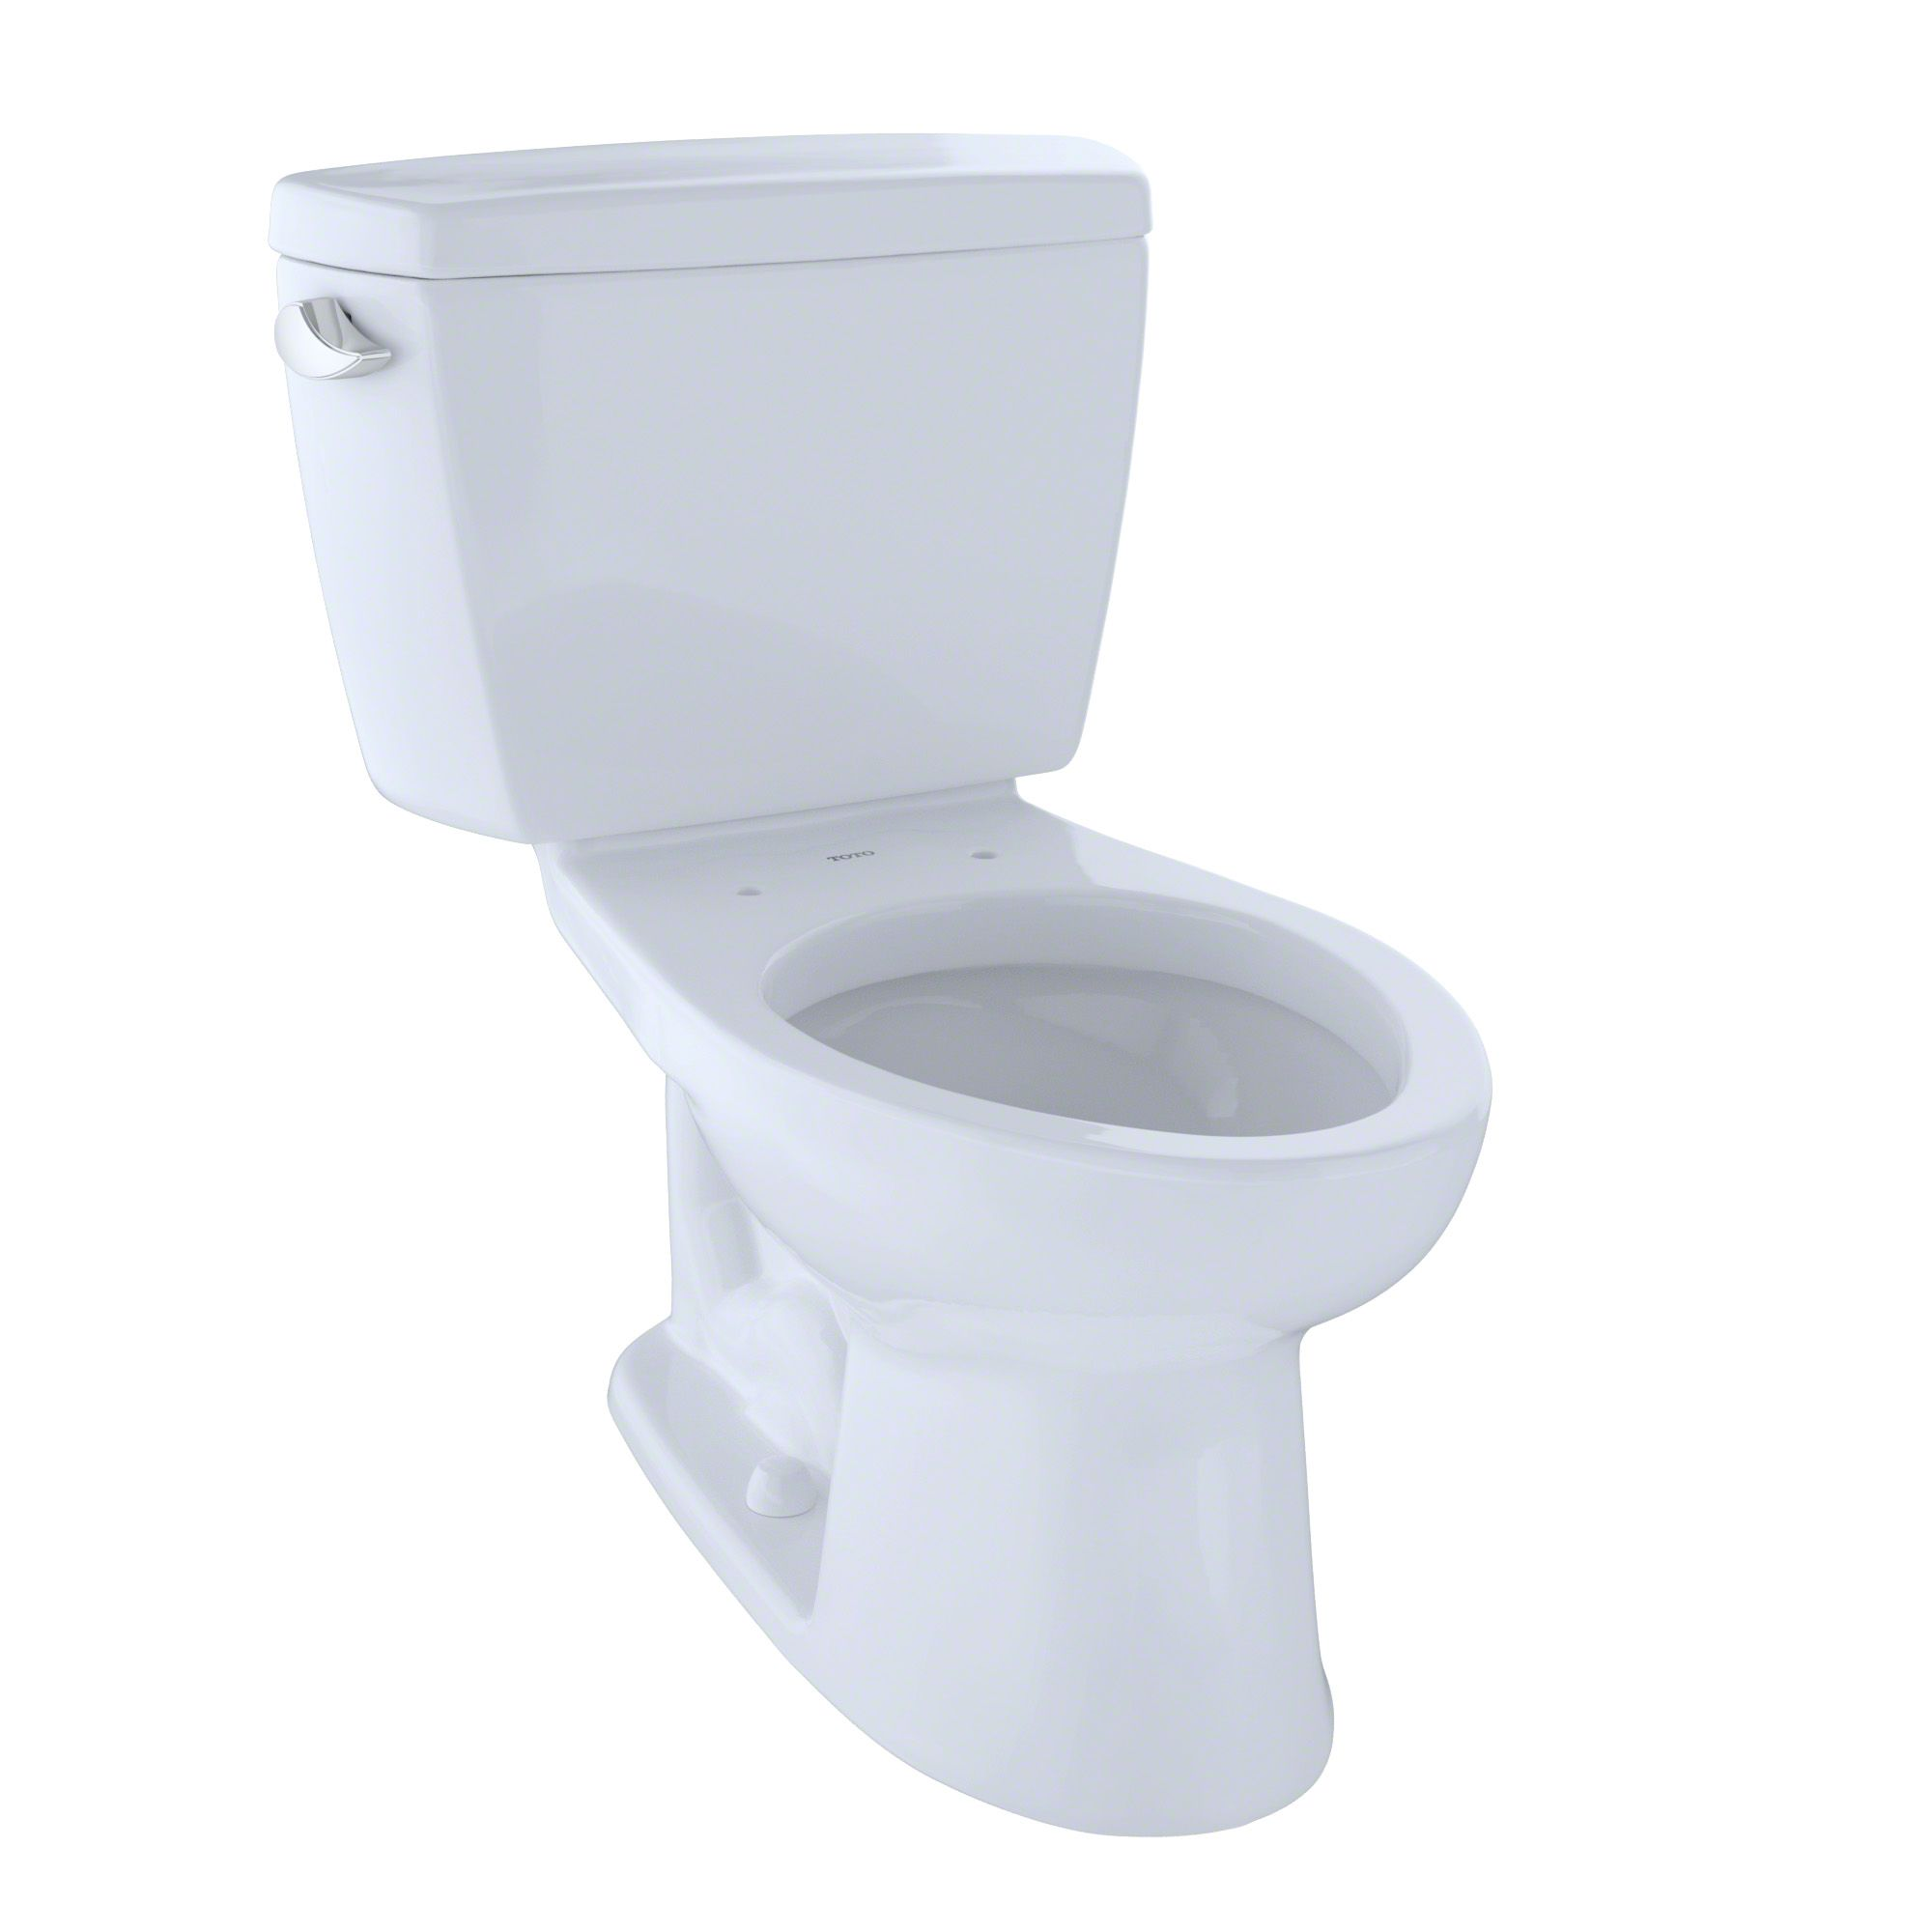 Toto Drake Two Piece Elongated 1 6 Gpf Universal Height Toilet For 10 Inch Rough In Cotton White Cst744sf 10 01 Toto Toilet Ada Toilet Toilet